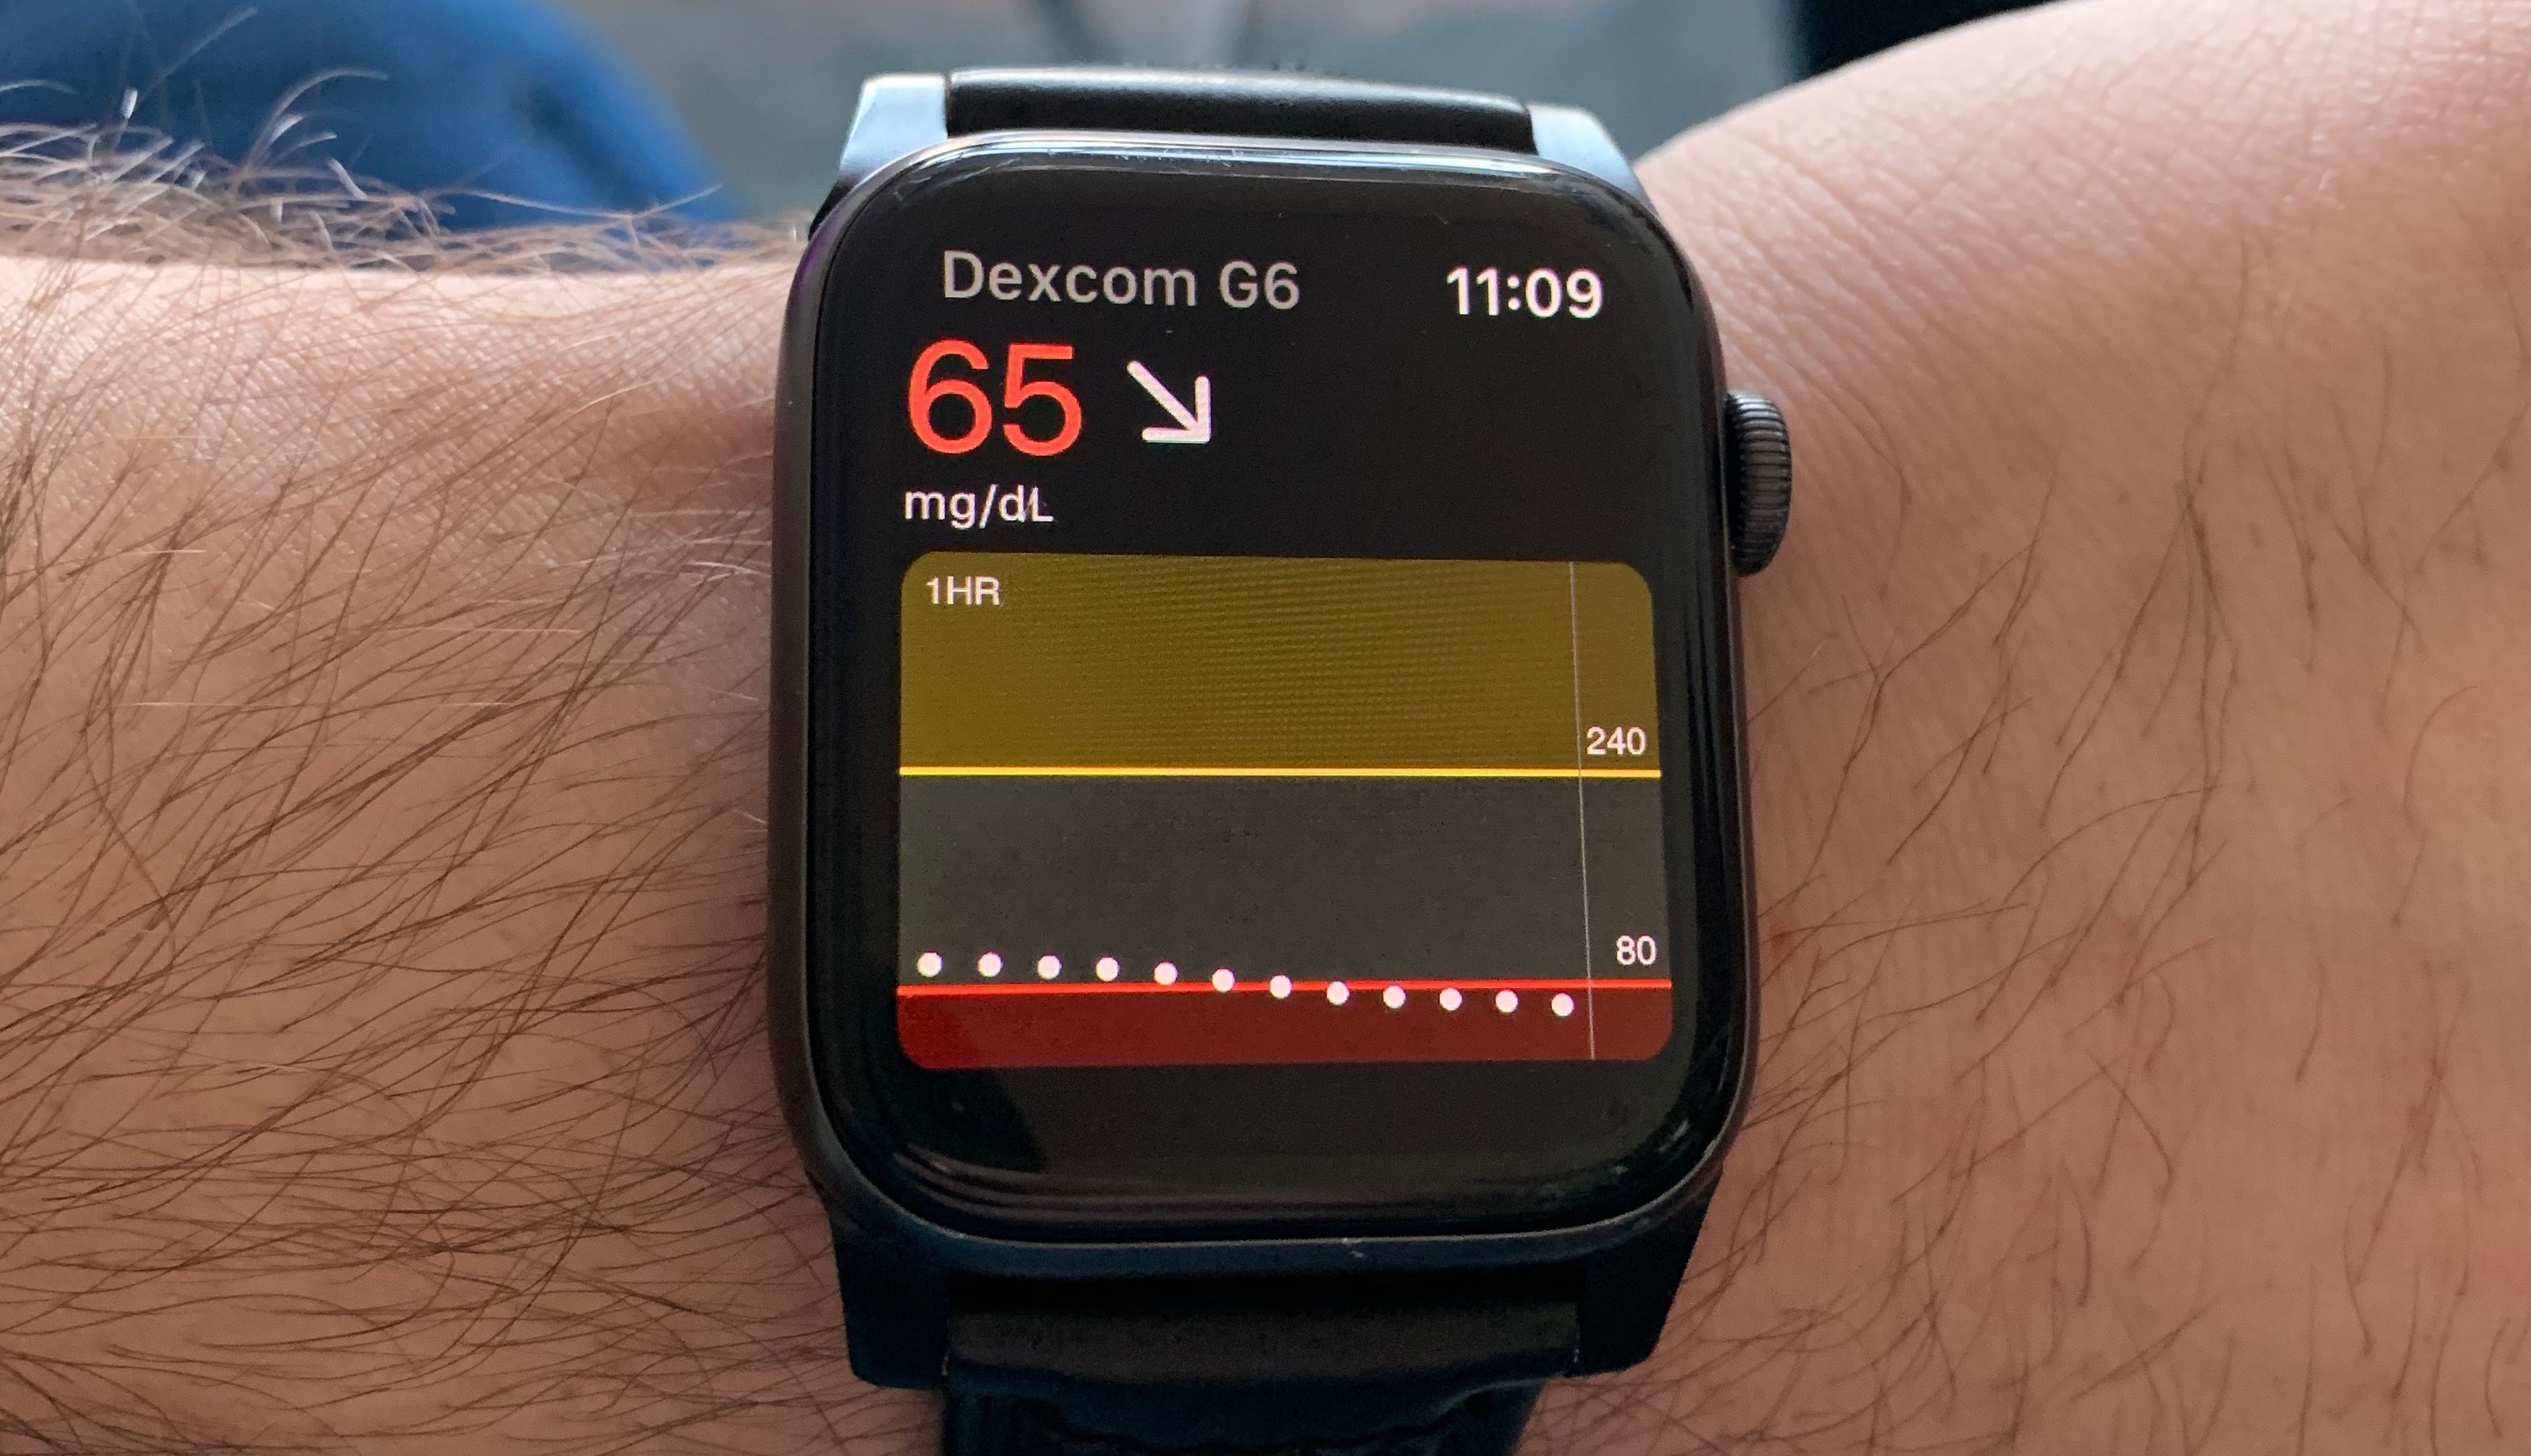 dexcom apple watch